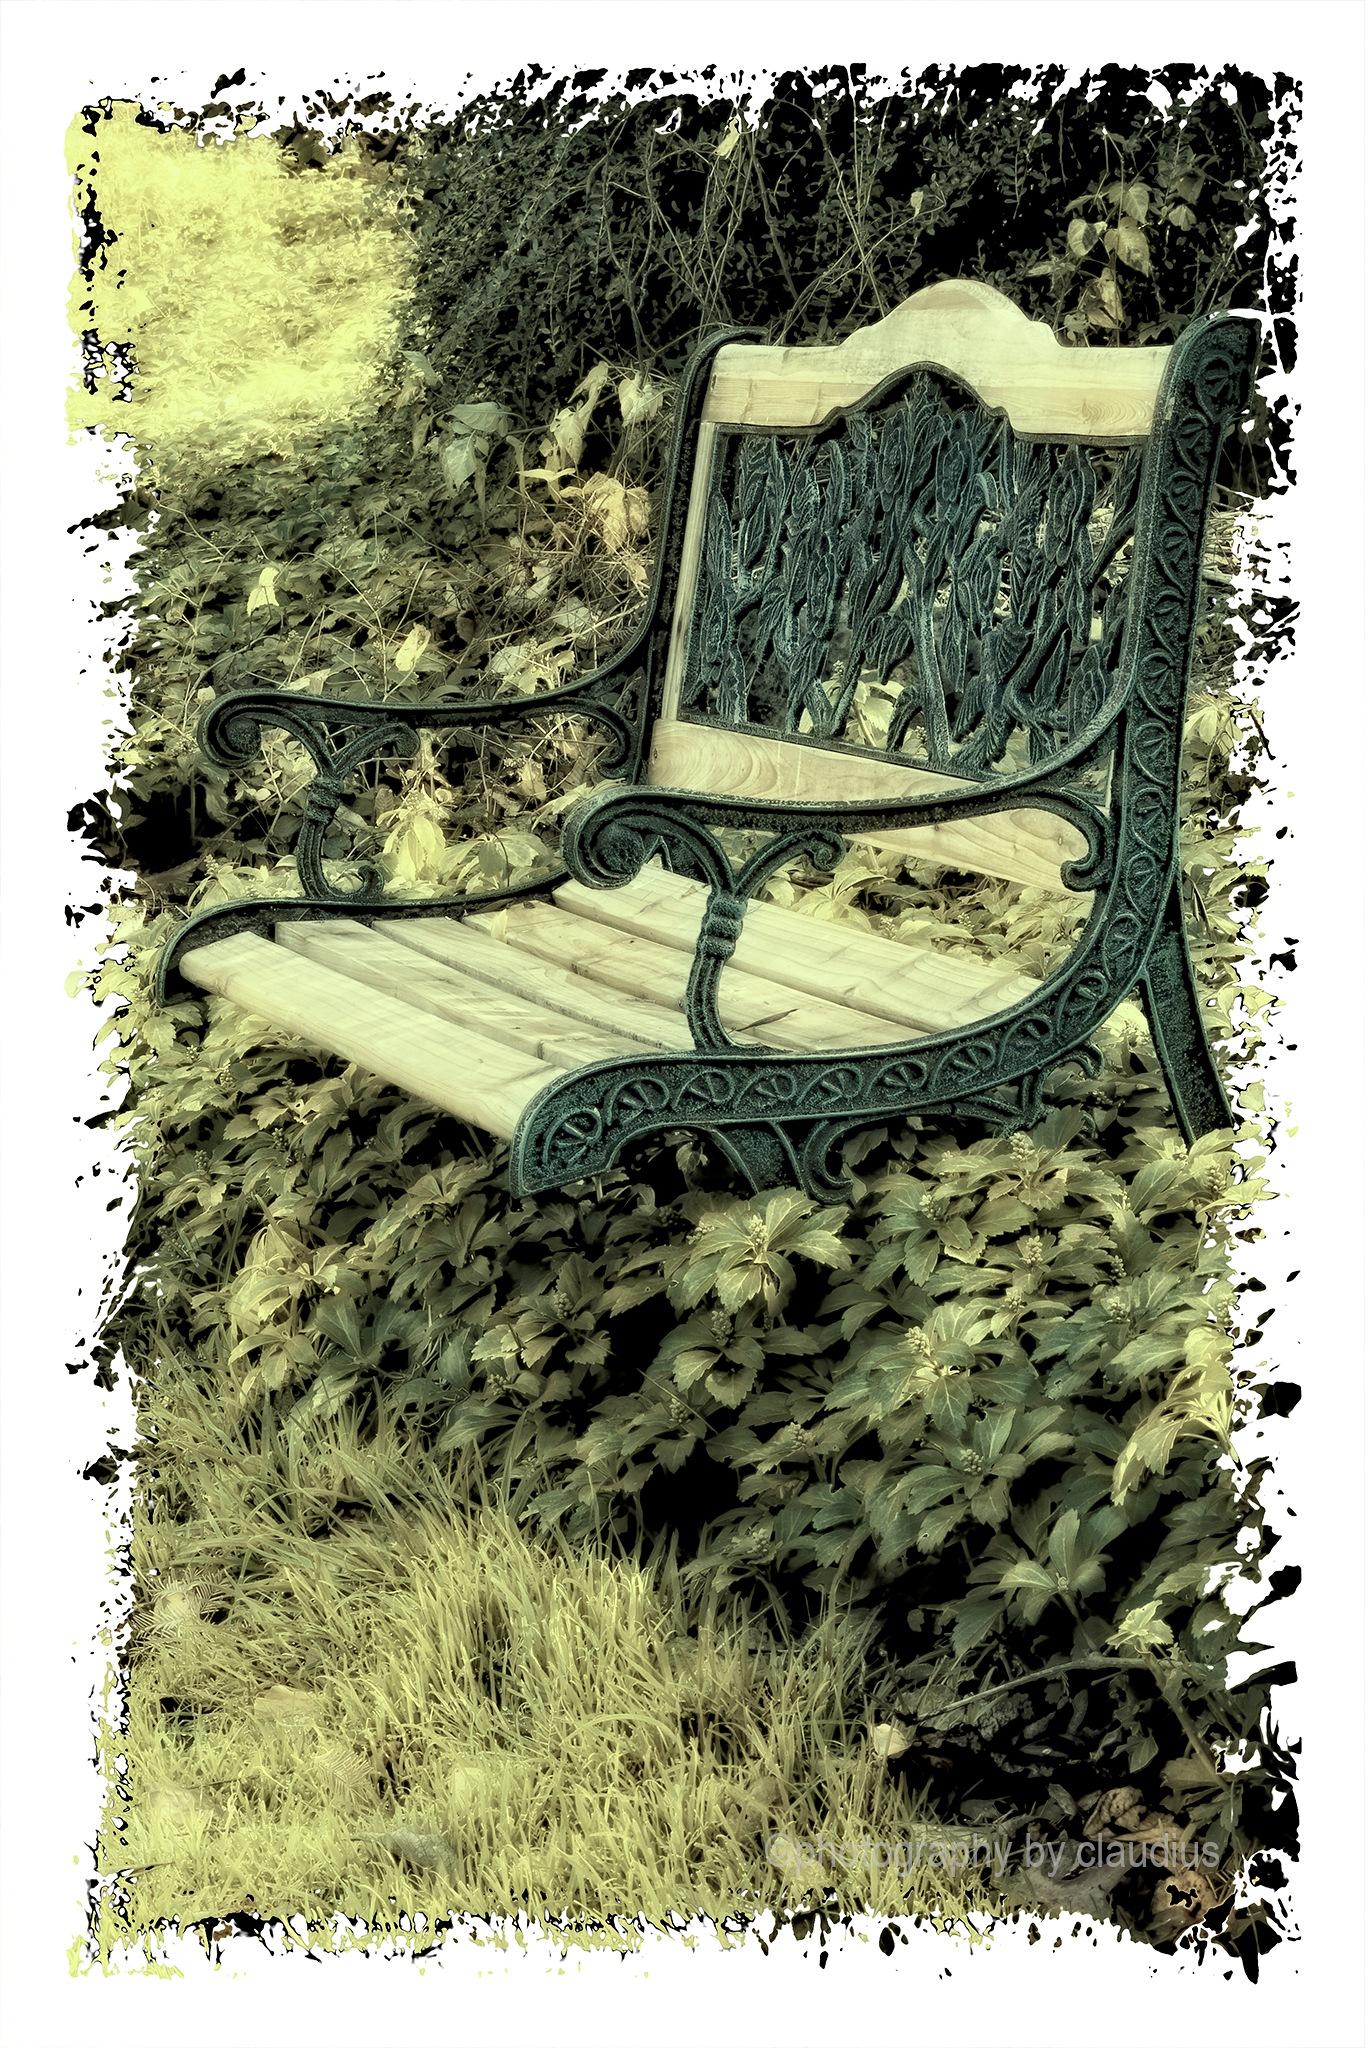 Faded memories... by Claudius Cazan